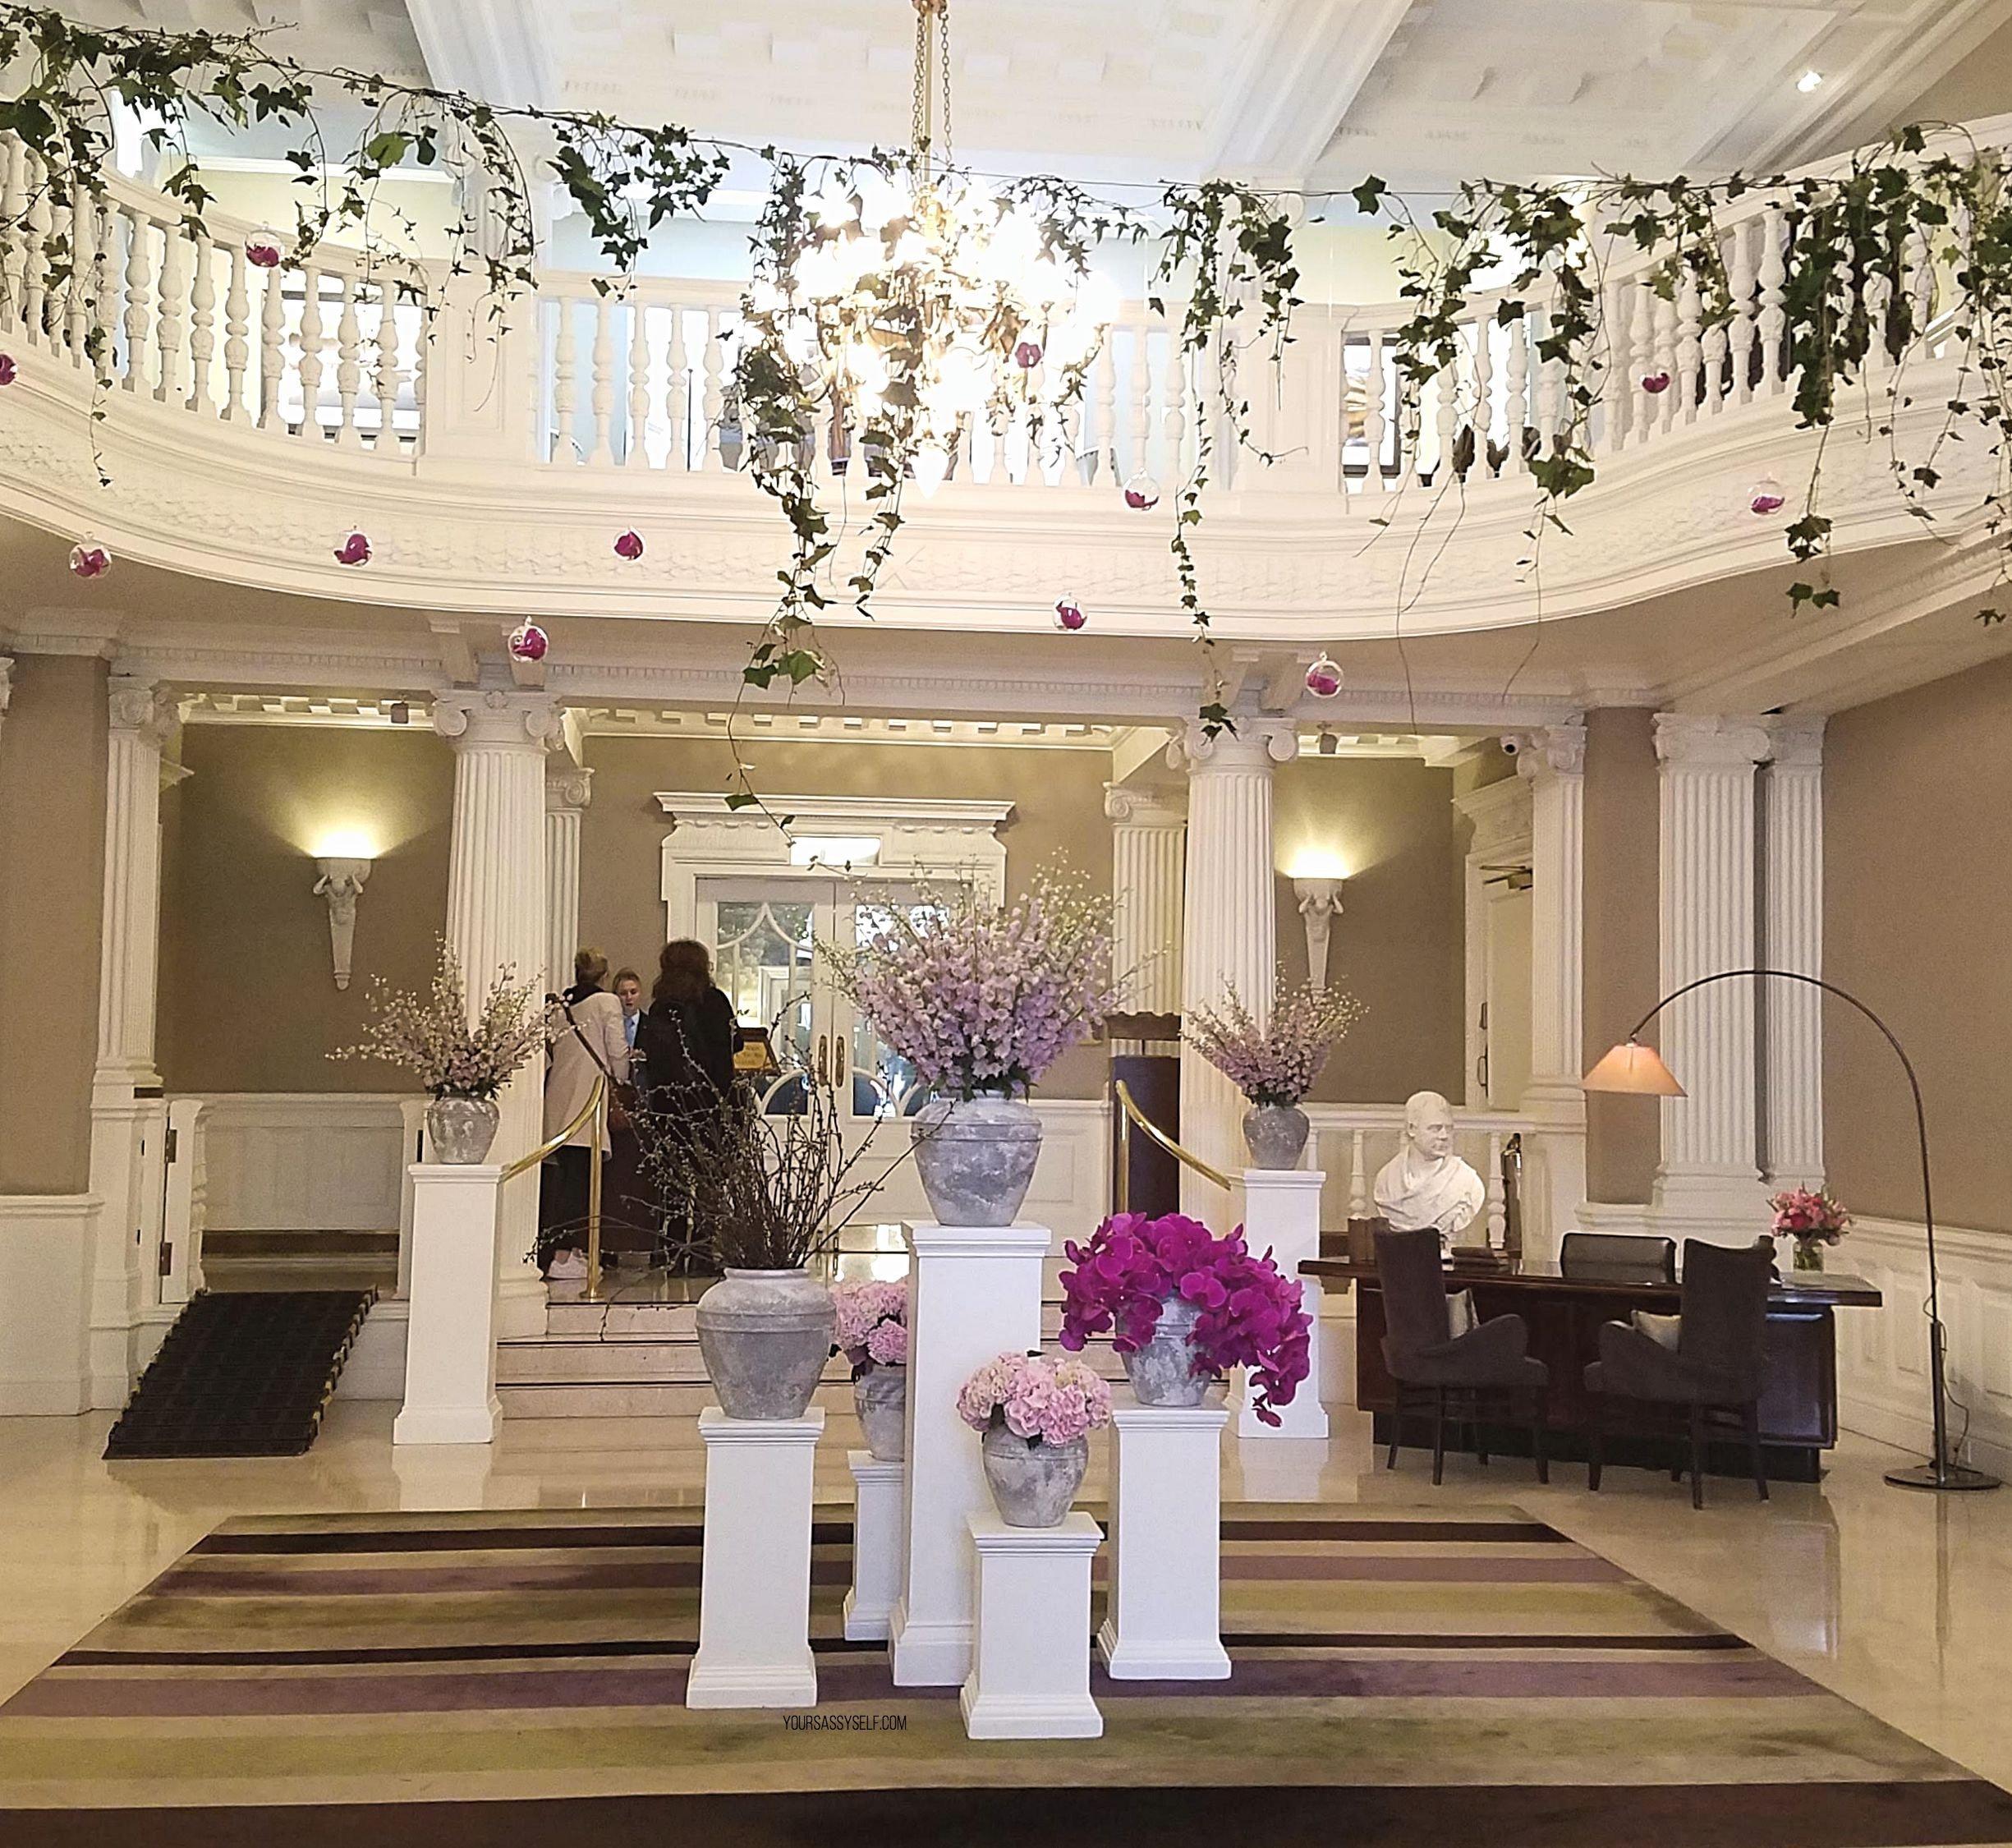 Balmoral Hotel Lobby - yoursassyself.com